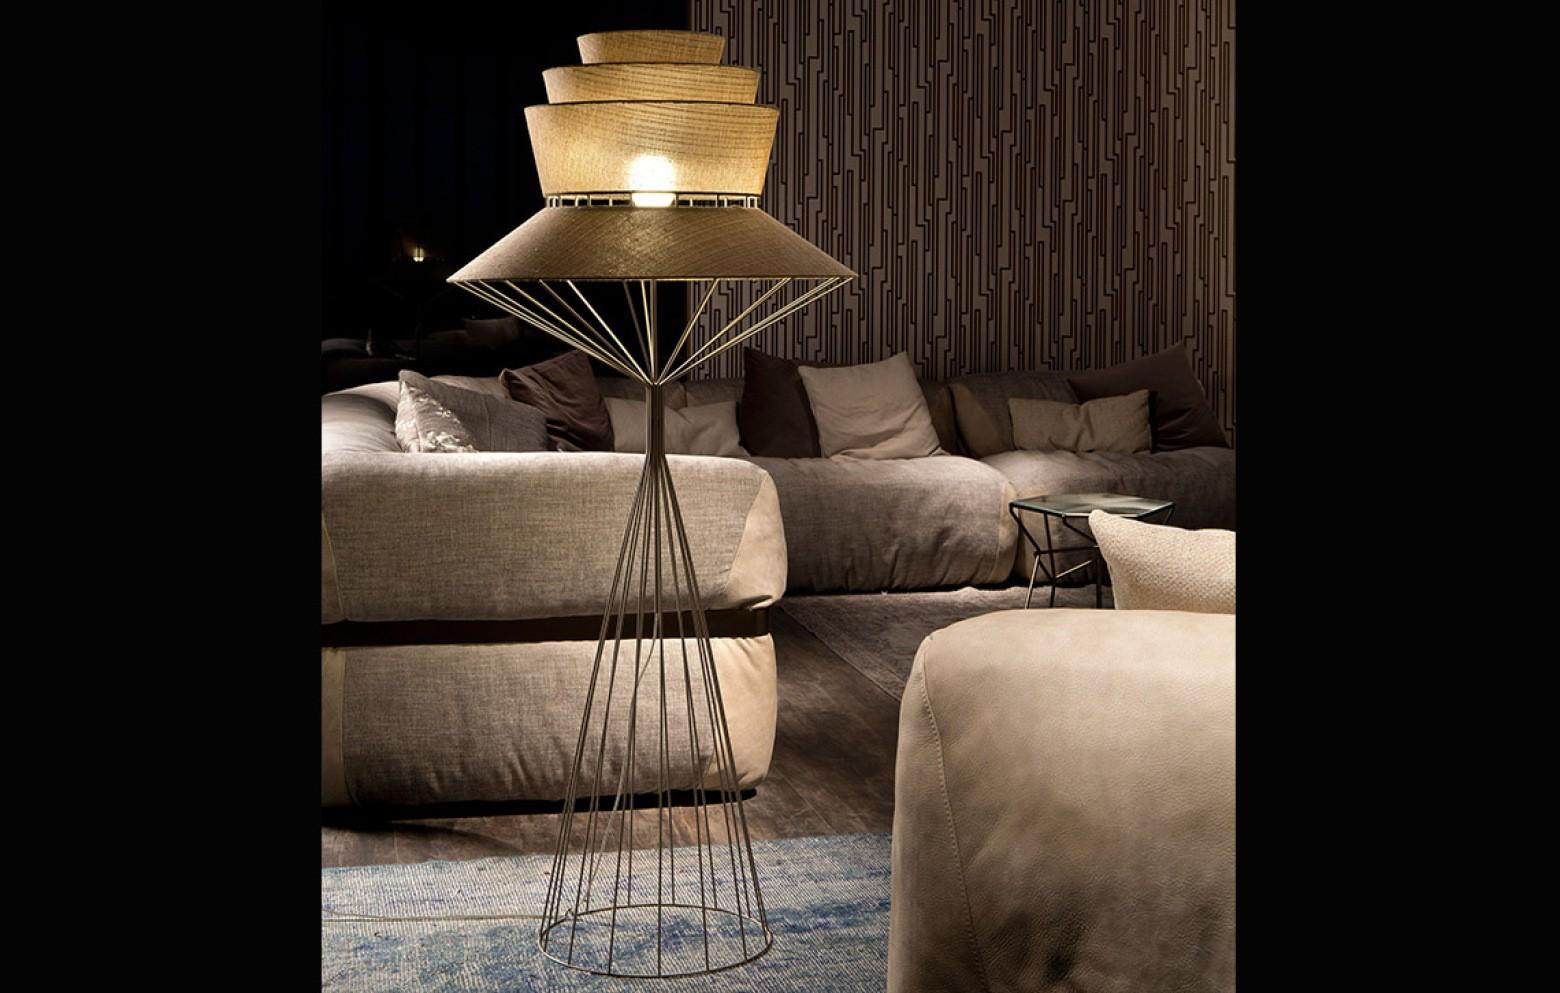 bolero stehlampe lampen kleinm bel accessoires who 39 s perfect. Black Bedroom Furniture Sets. Home Design Ideas